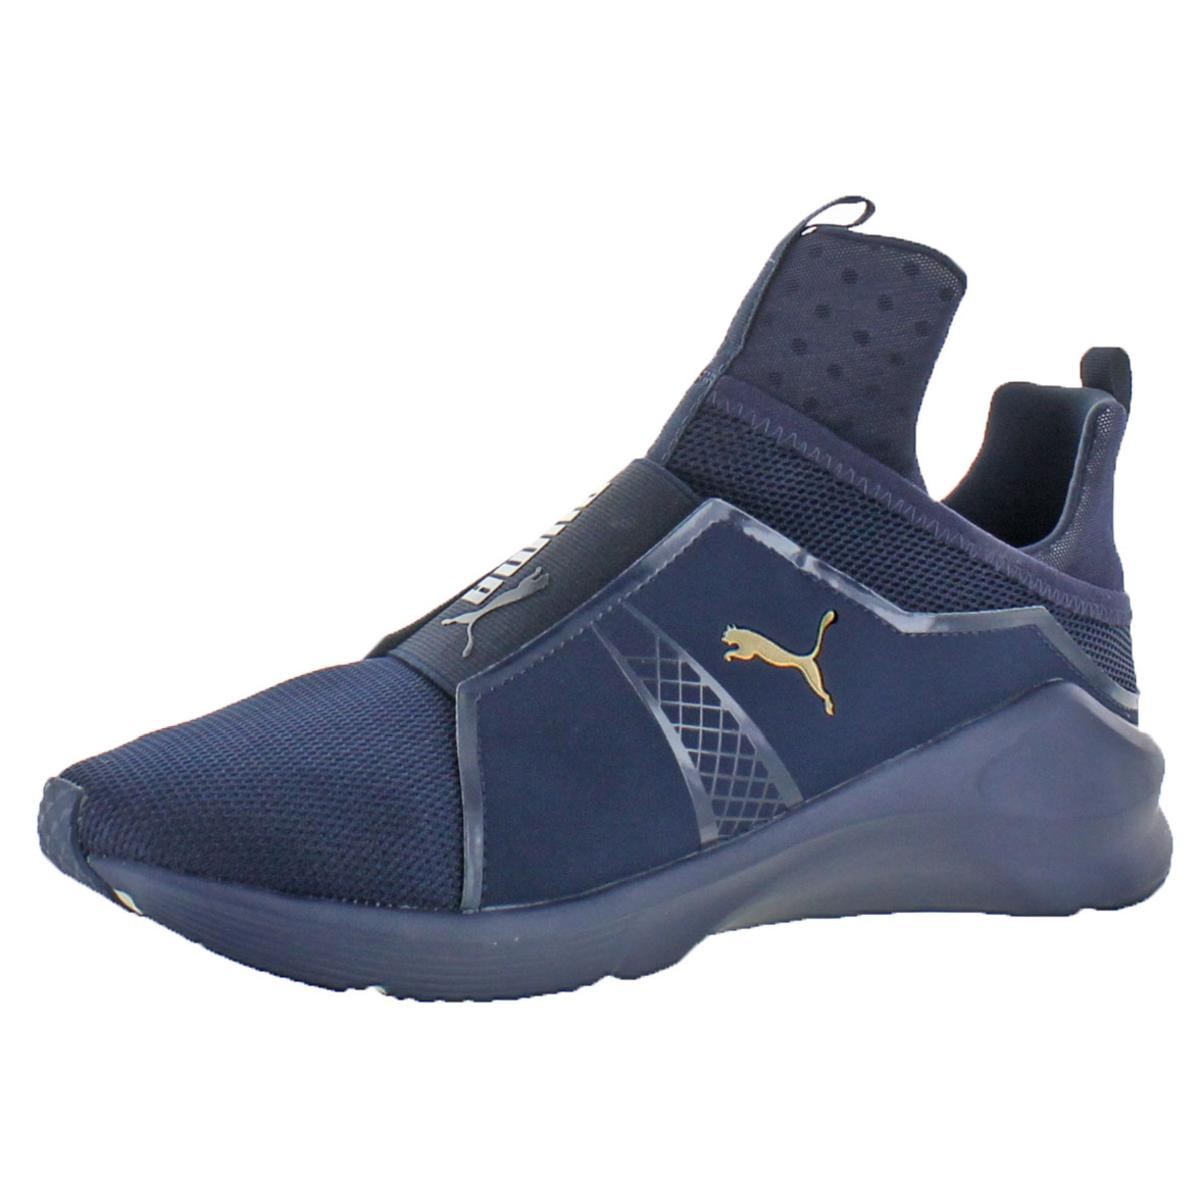 c37ebed15cd5e0 Details about Puma Mens Fierce Core Mono Navy Trainers Sneakers 11 Medium  (D) BHFO 5426